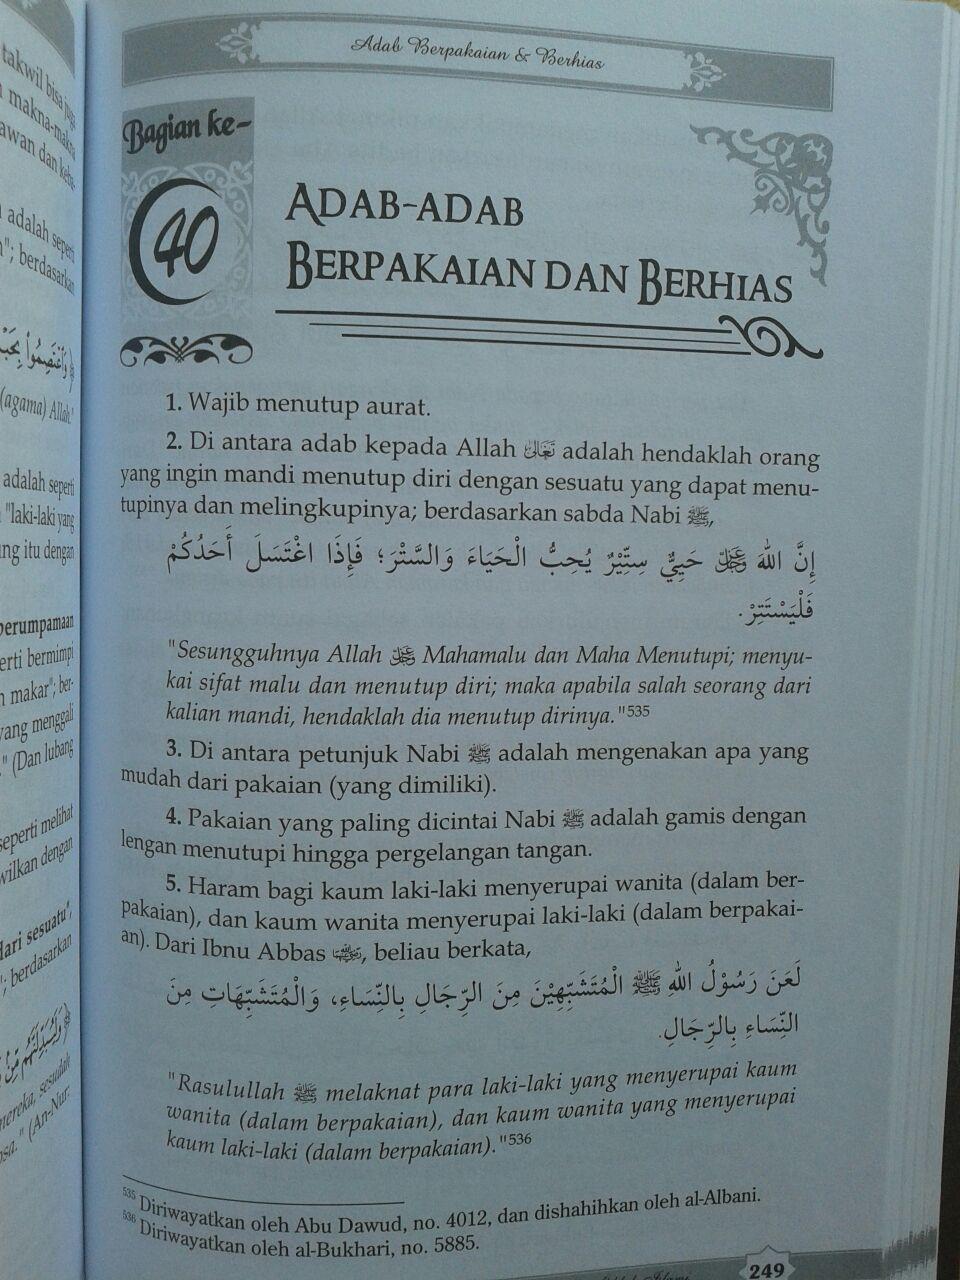 Buku Panduan Lengkap Praktis Adab dan Akhlak Islami isi 6